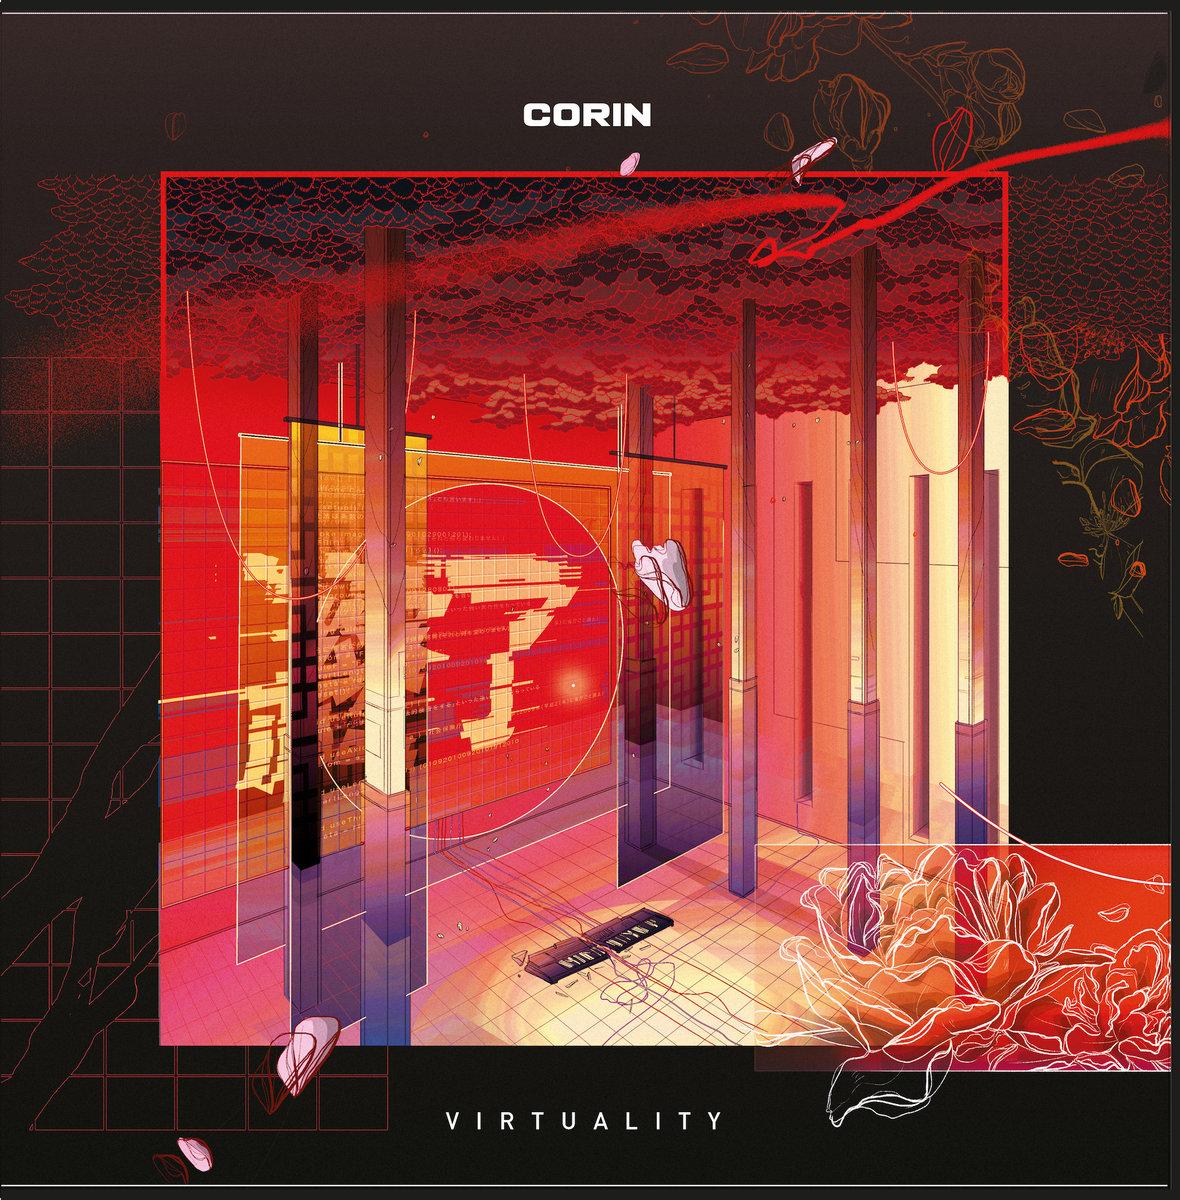 Virtuality - CORIN